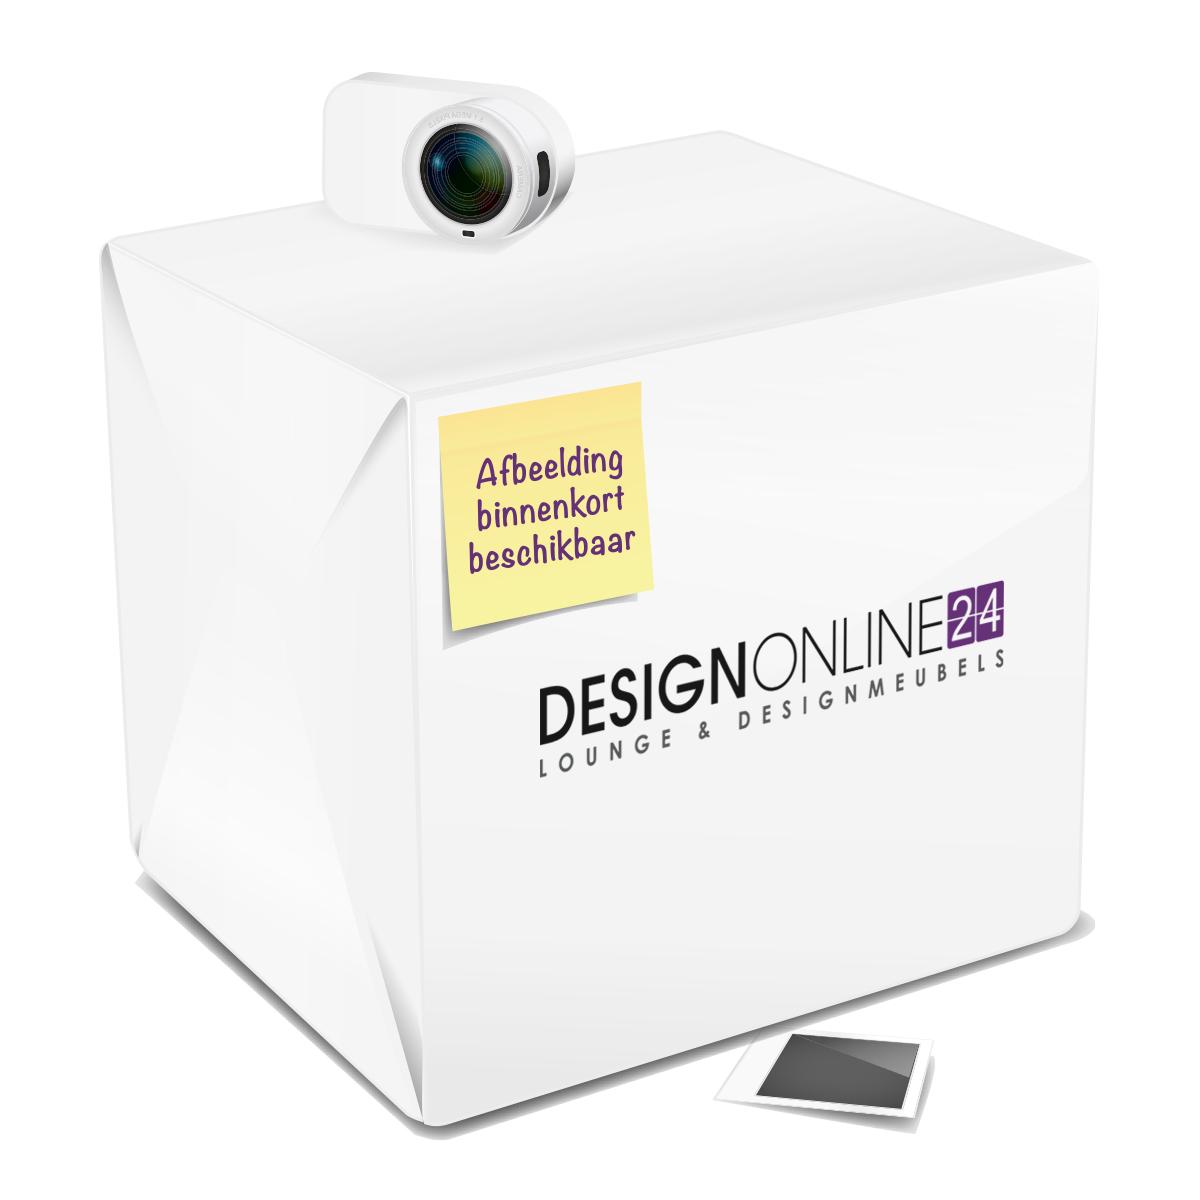 24Designs 24Designs Barkruk Tessa - Zithoogte 85 cm - Mat RVS onderstel - Kunstleren zitting - Groen